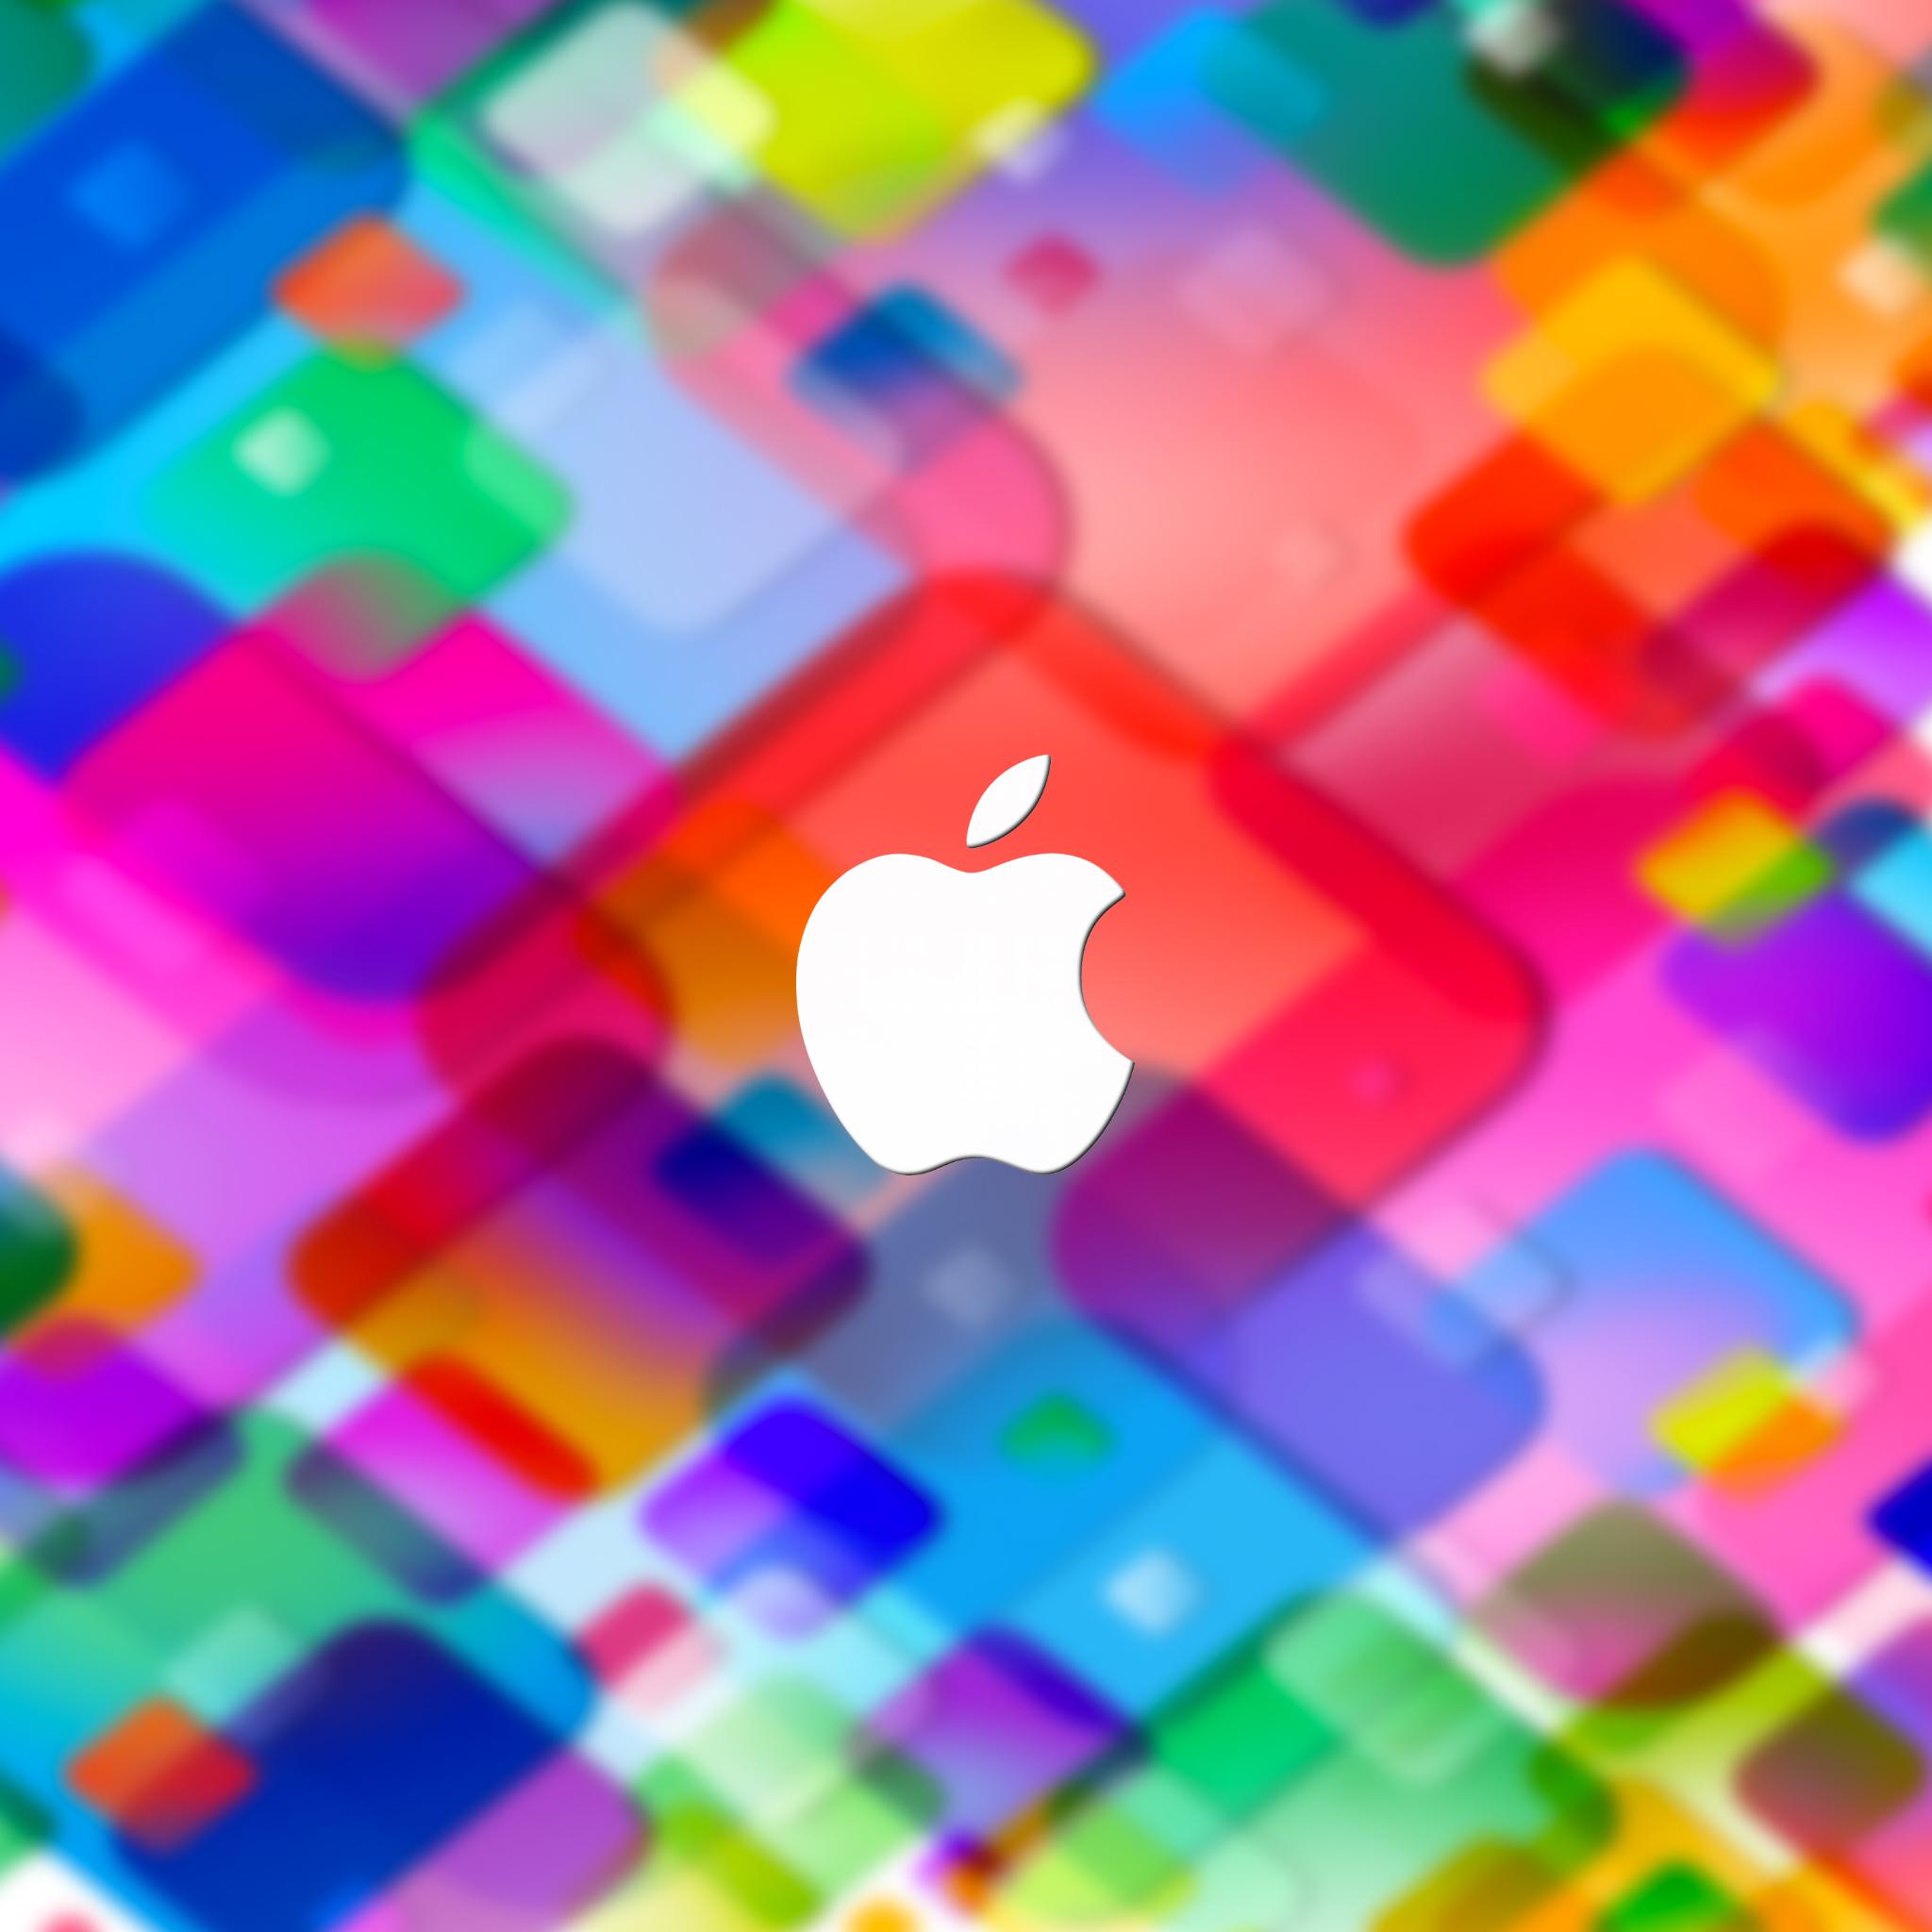 WWDC_2012_3Wallpapers-iPad-Retina